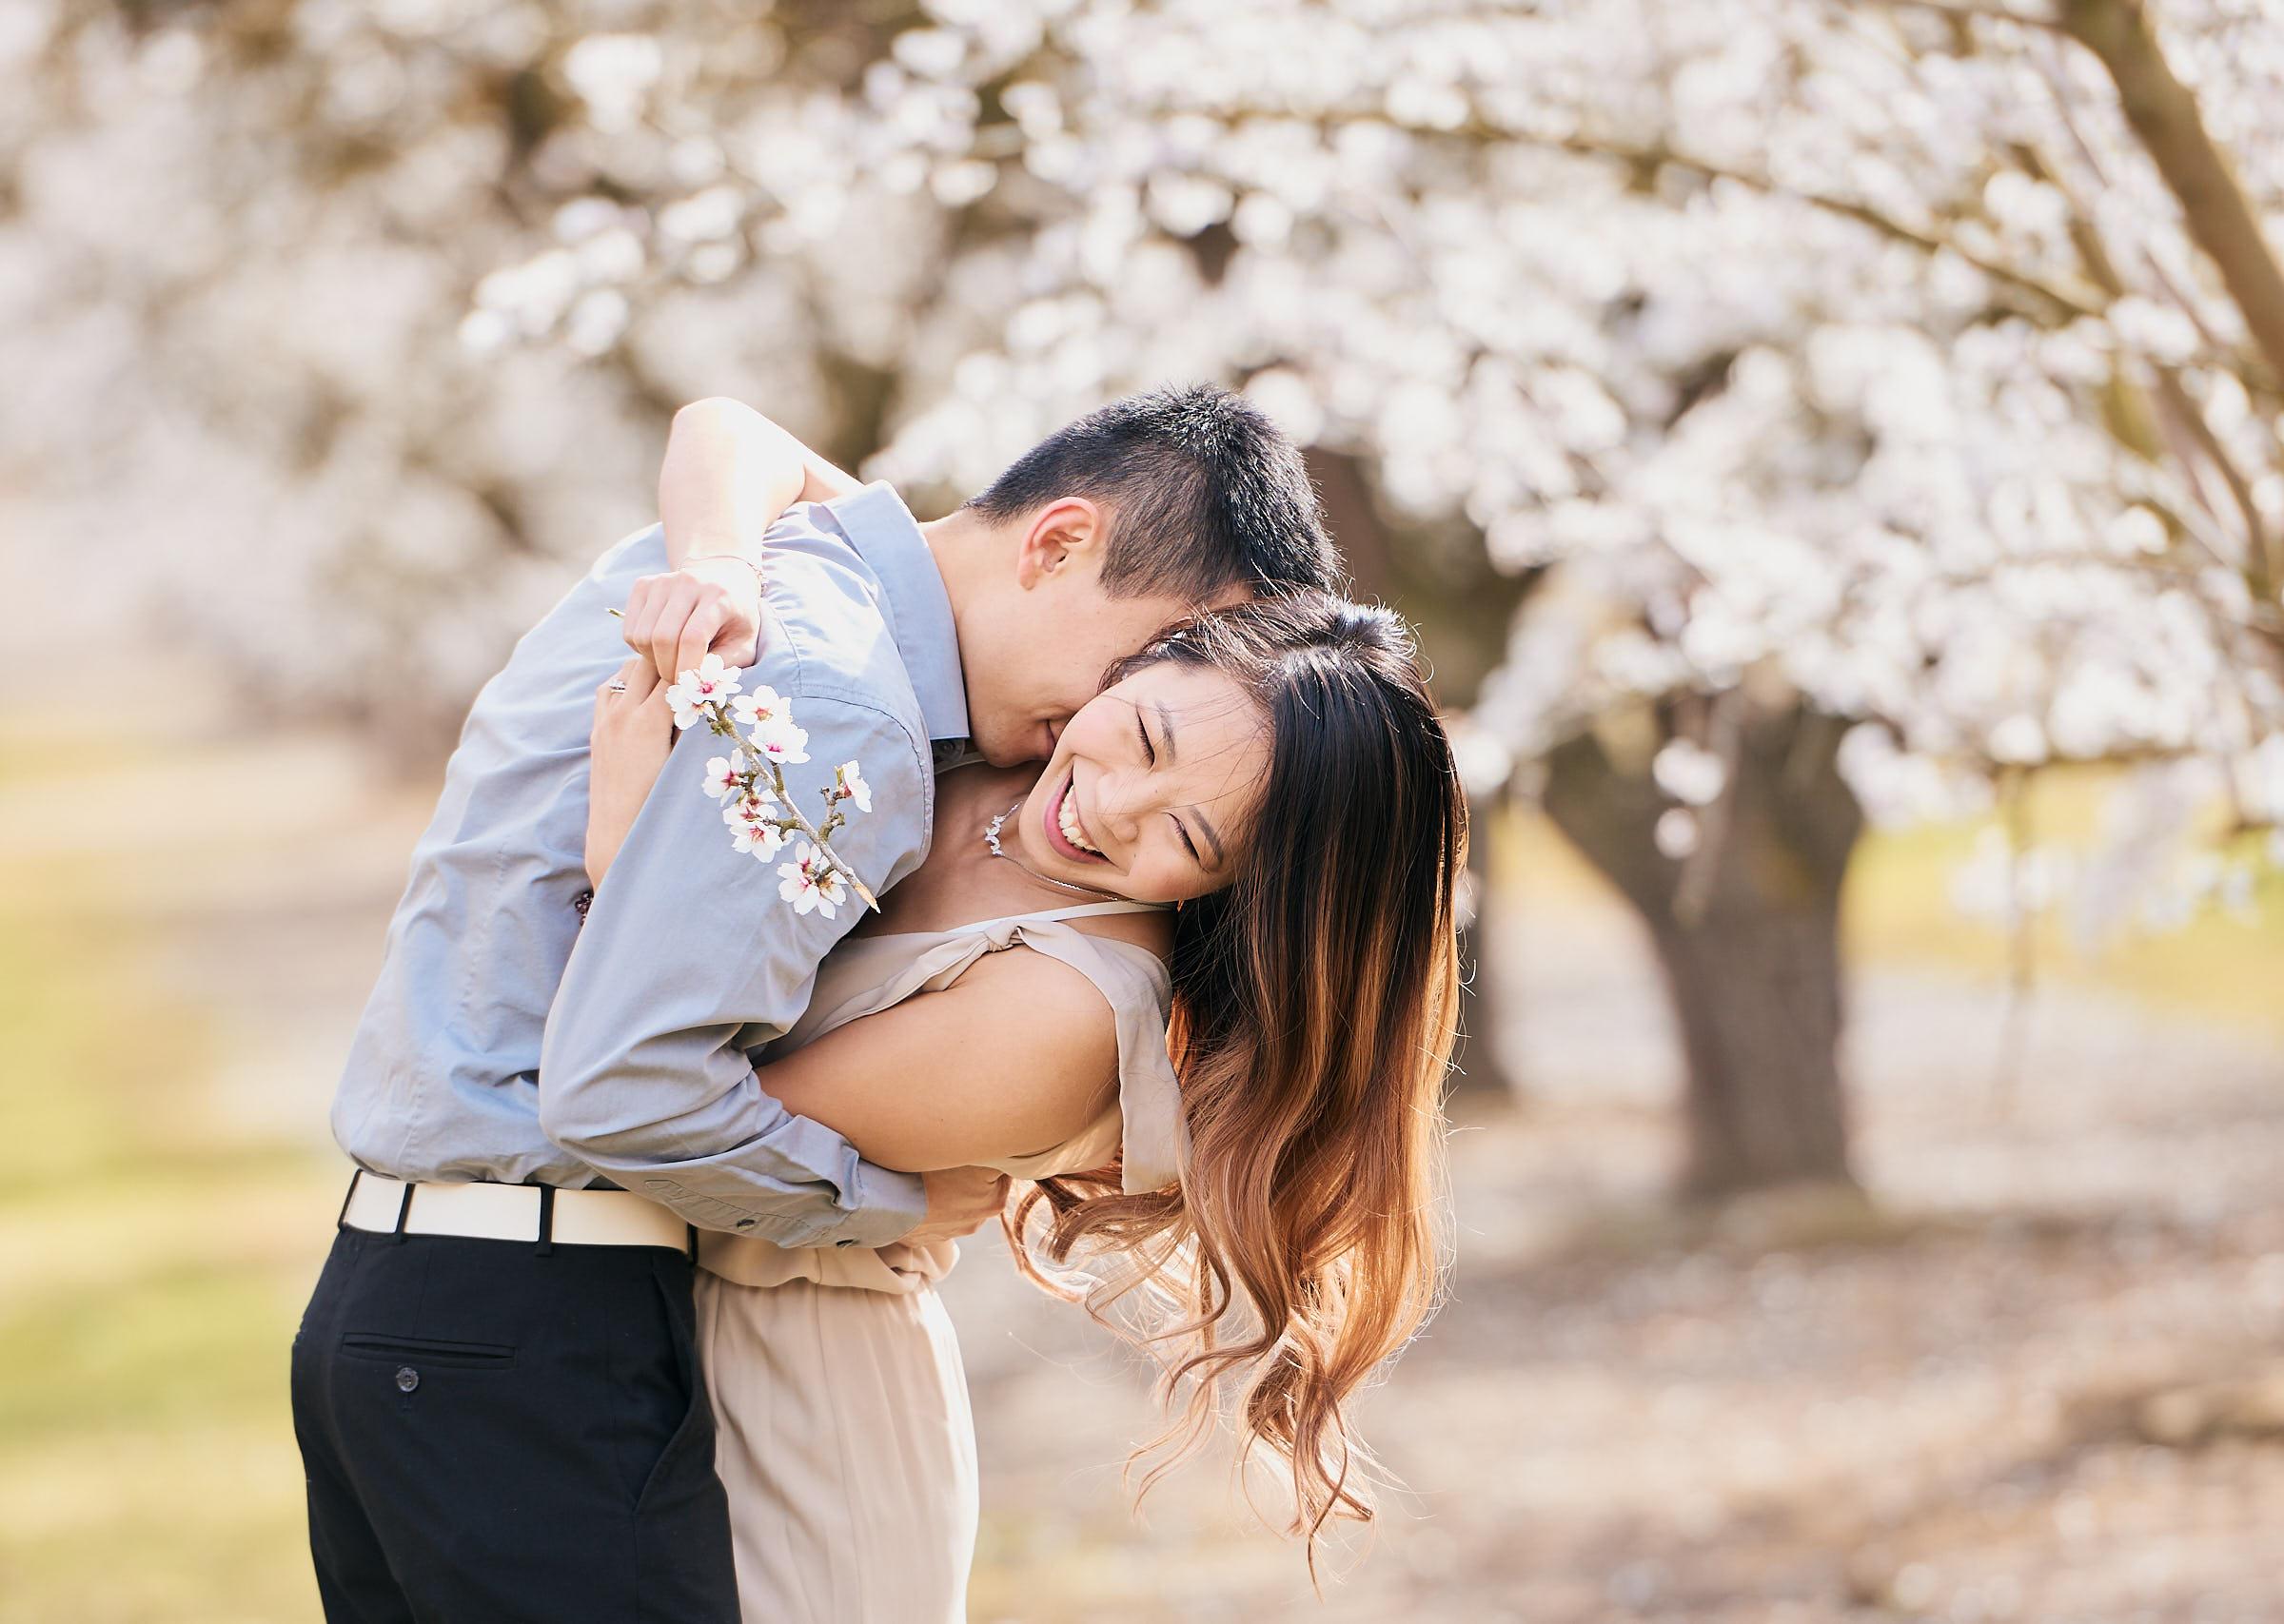 Fun Couples Engagement Session Kauai Photographer